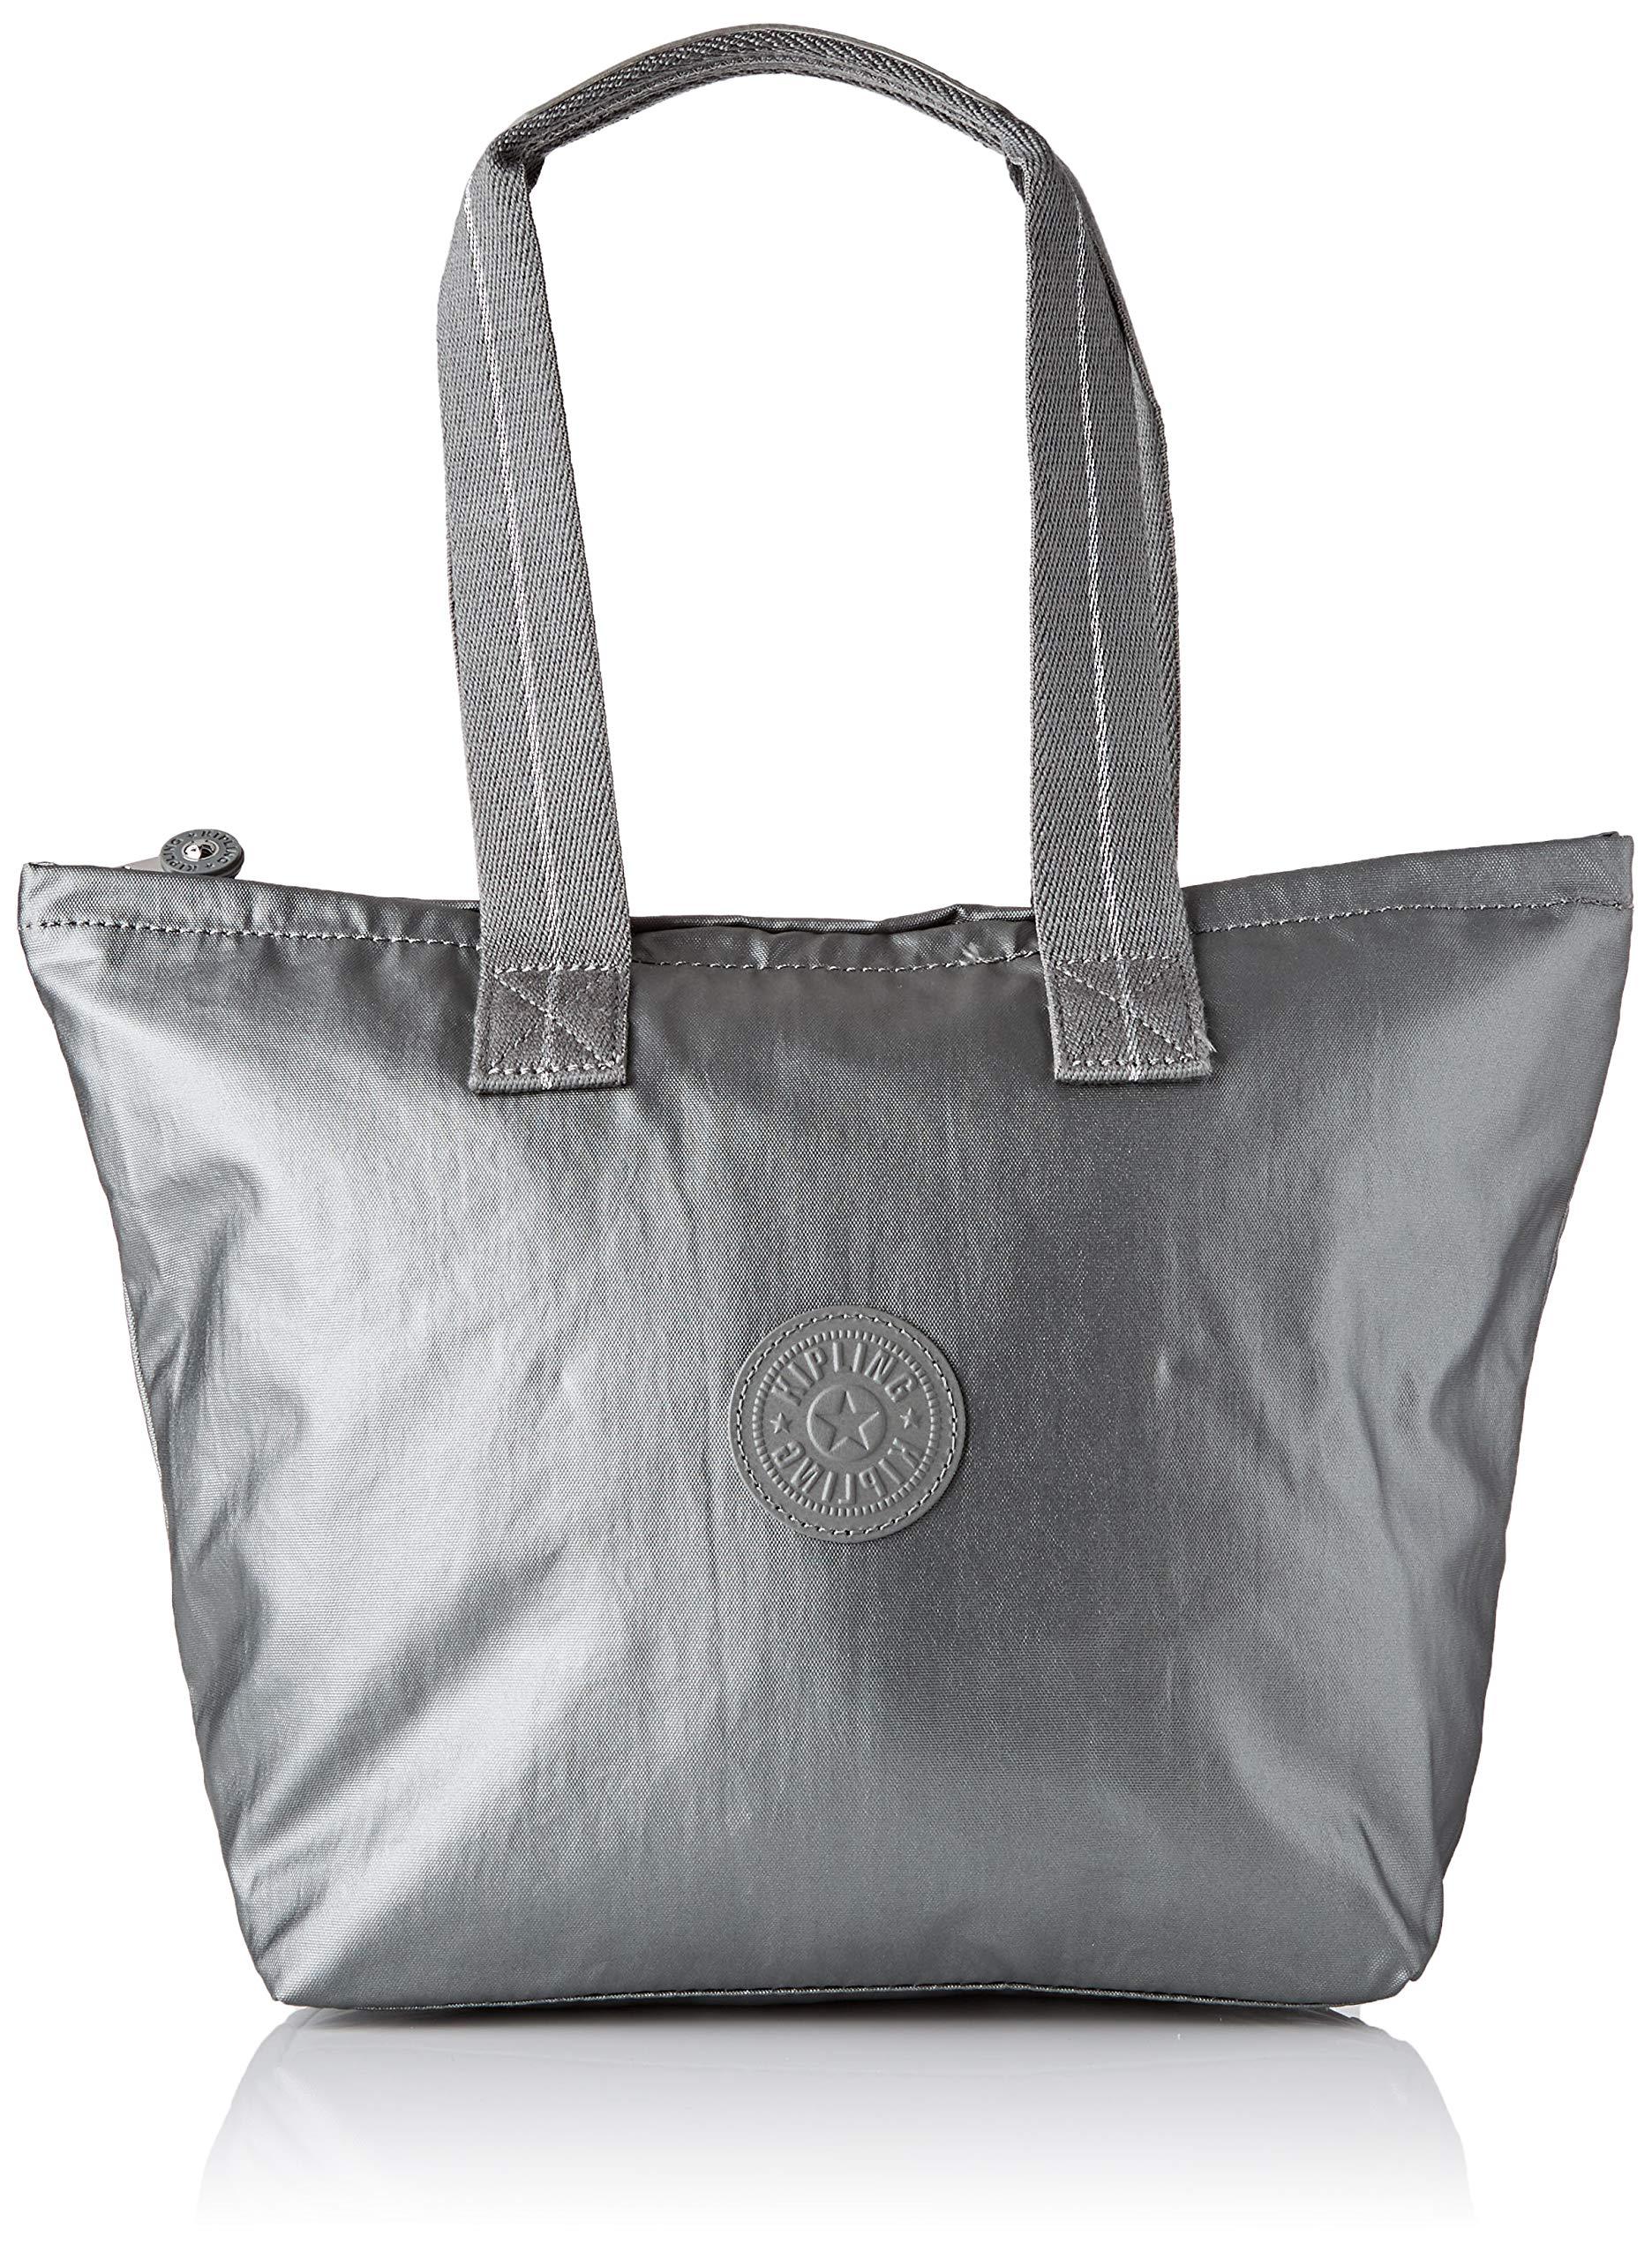 Kipling NIAMH Bag Organiser, 36 cm, 9 liters, Grey (Metallic Stony)